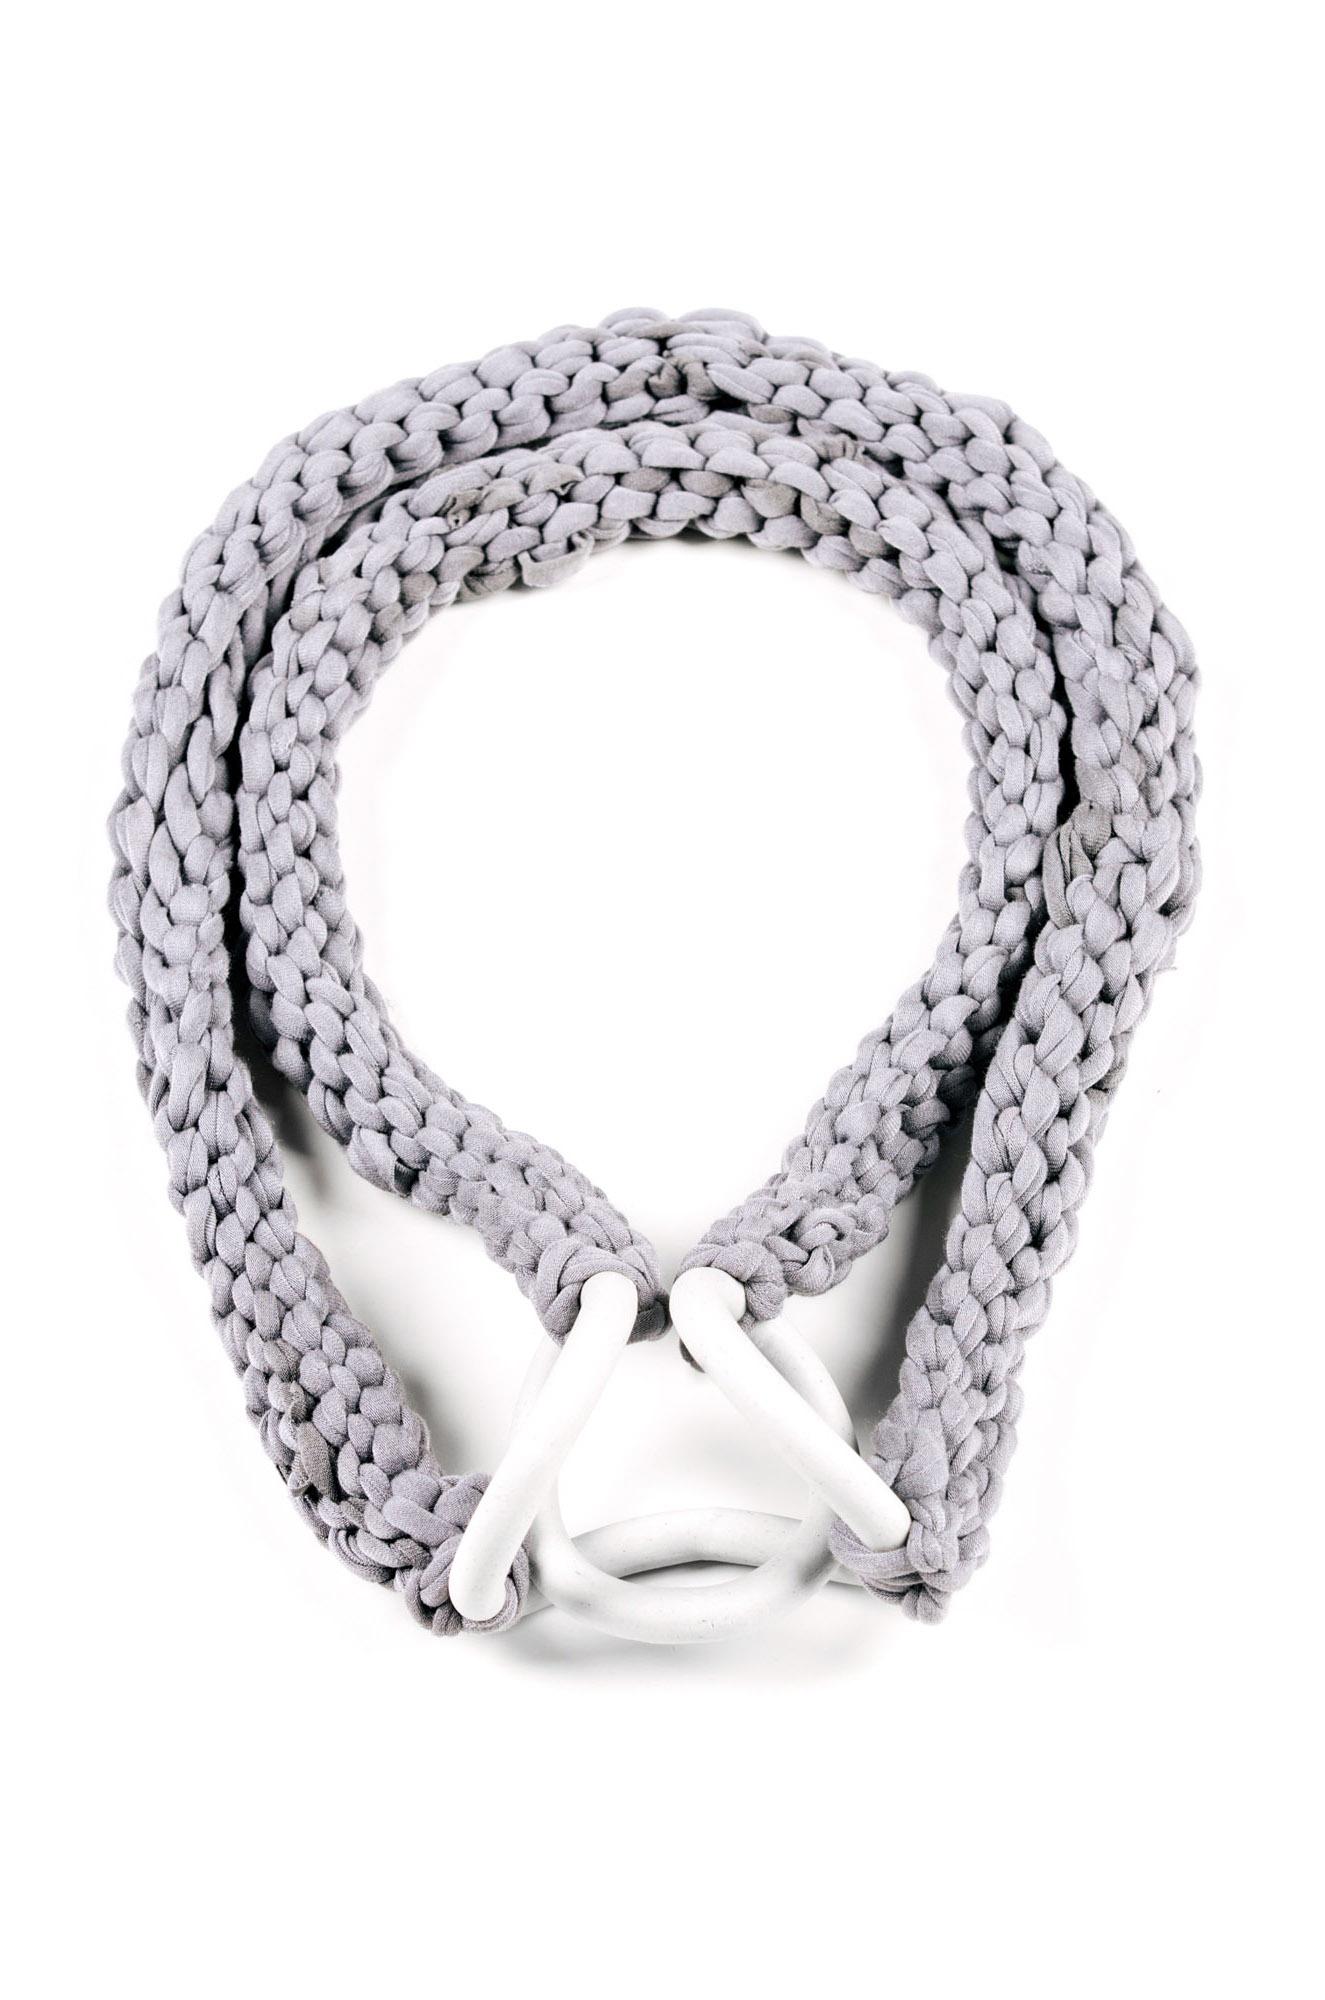 Bocco necklace by Anna Borshi 07.jpg